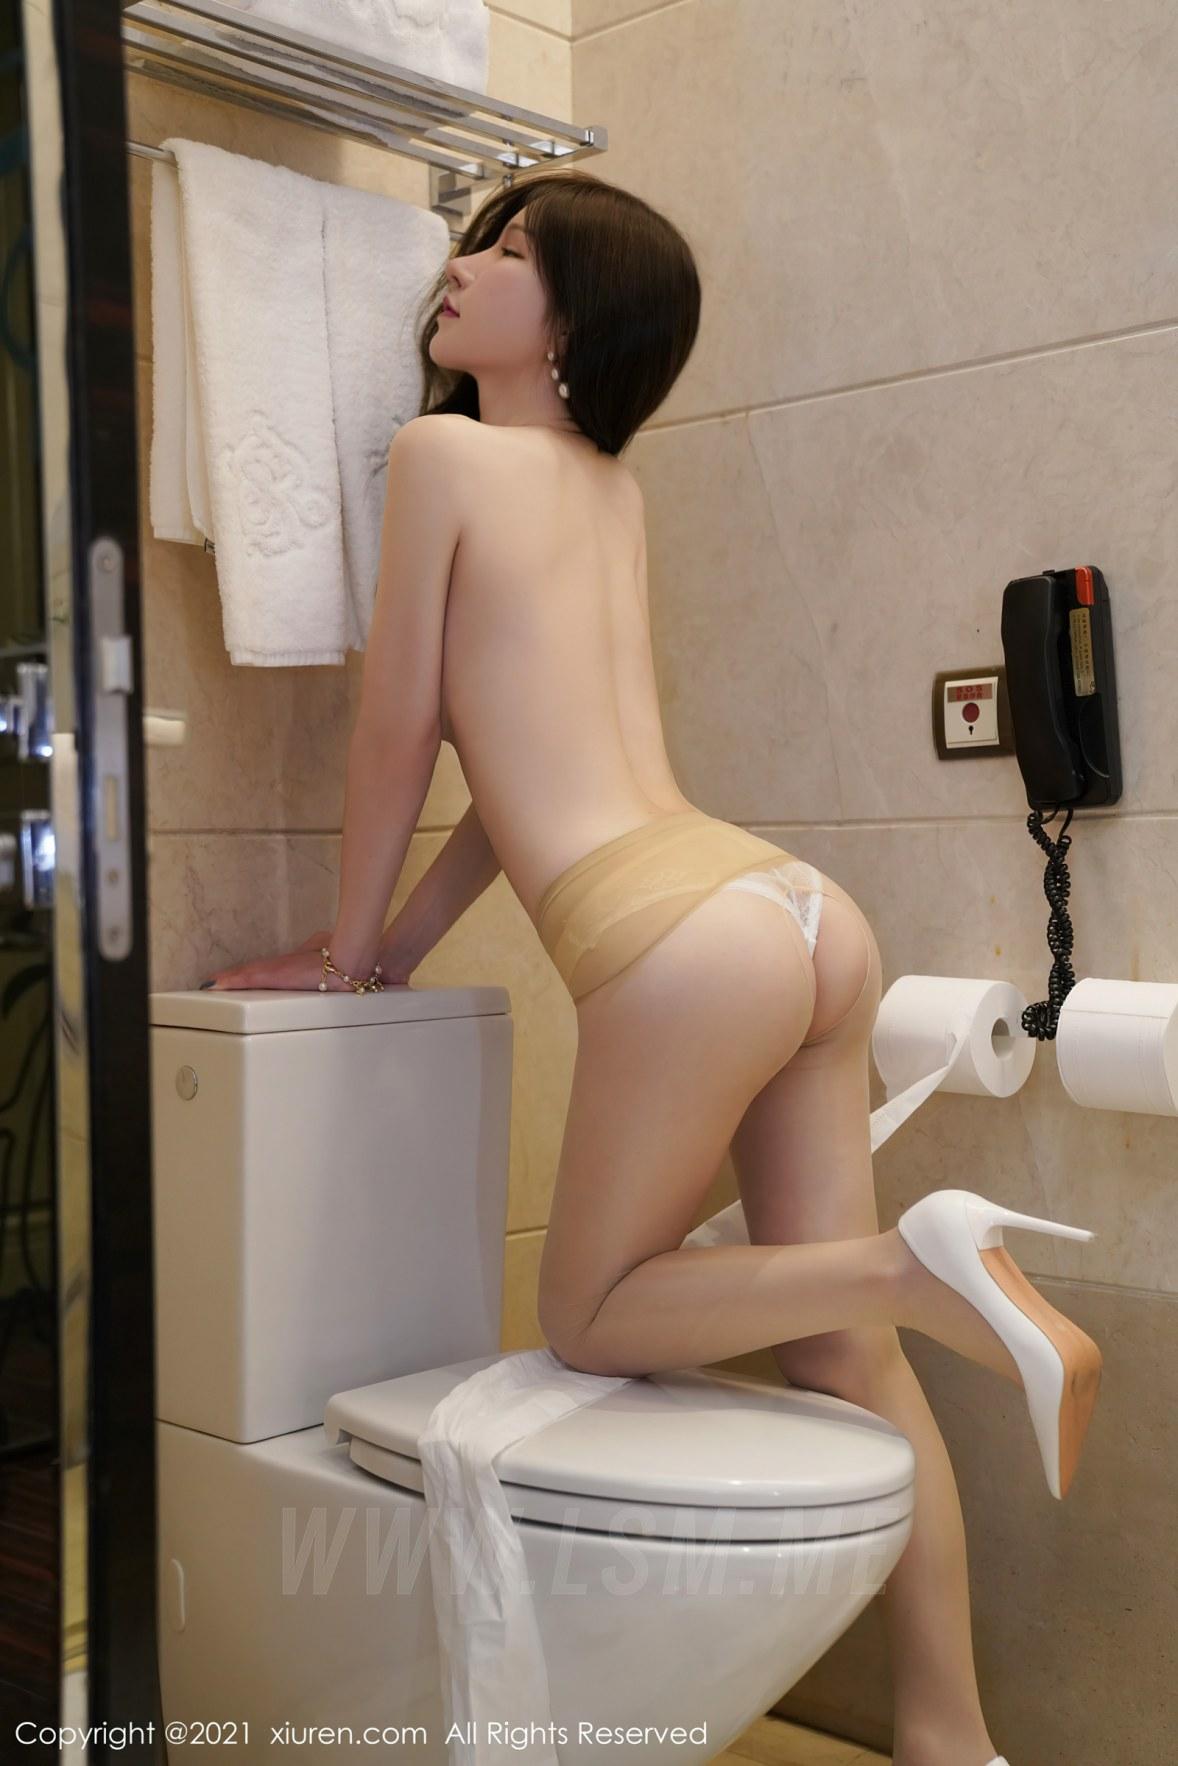 3576 089 qom 3603 5400 - XiuRen 秀人 No.3576 周于希sandy 浴室诱惑 - 秀人网 -【免费在线写真】【丽人丝语】